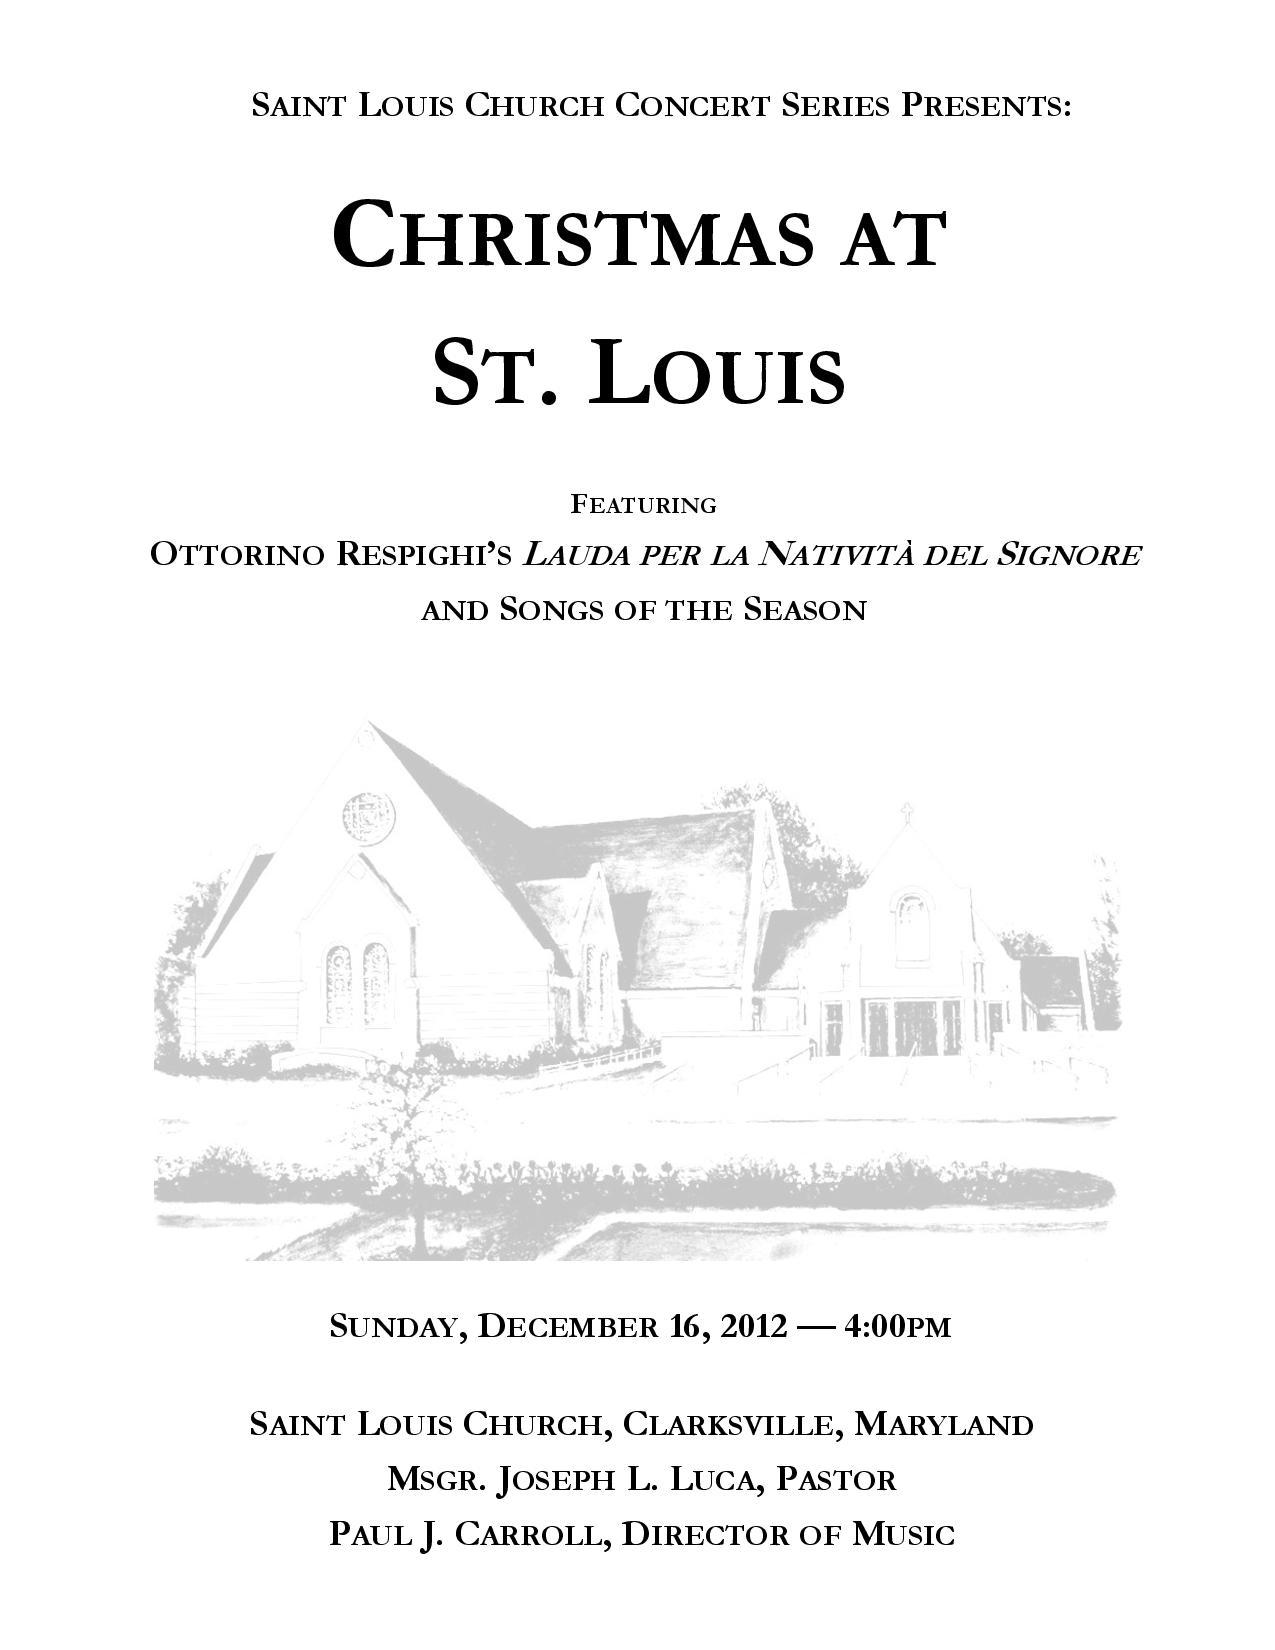 2012-12-16 Program Draft - 2012-12-11 v2-page-001.jpg